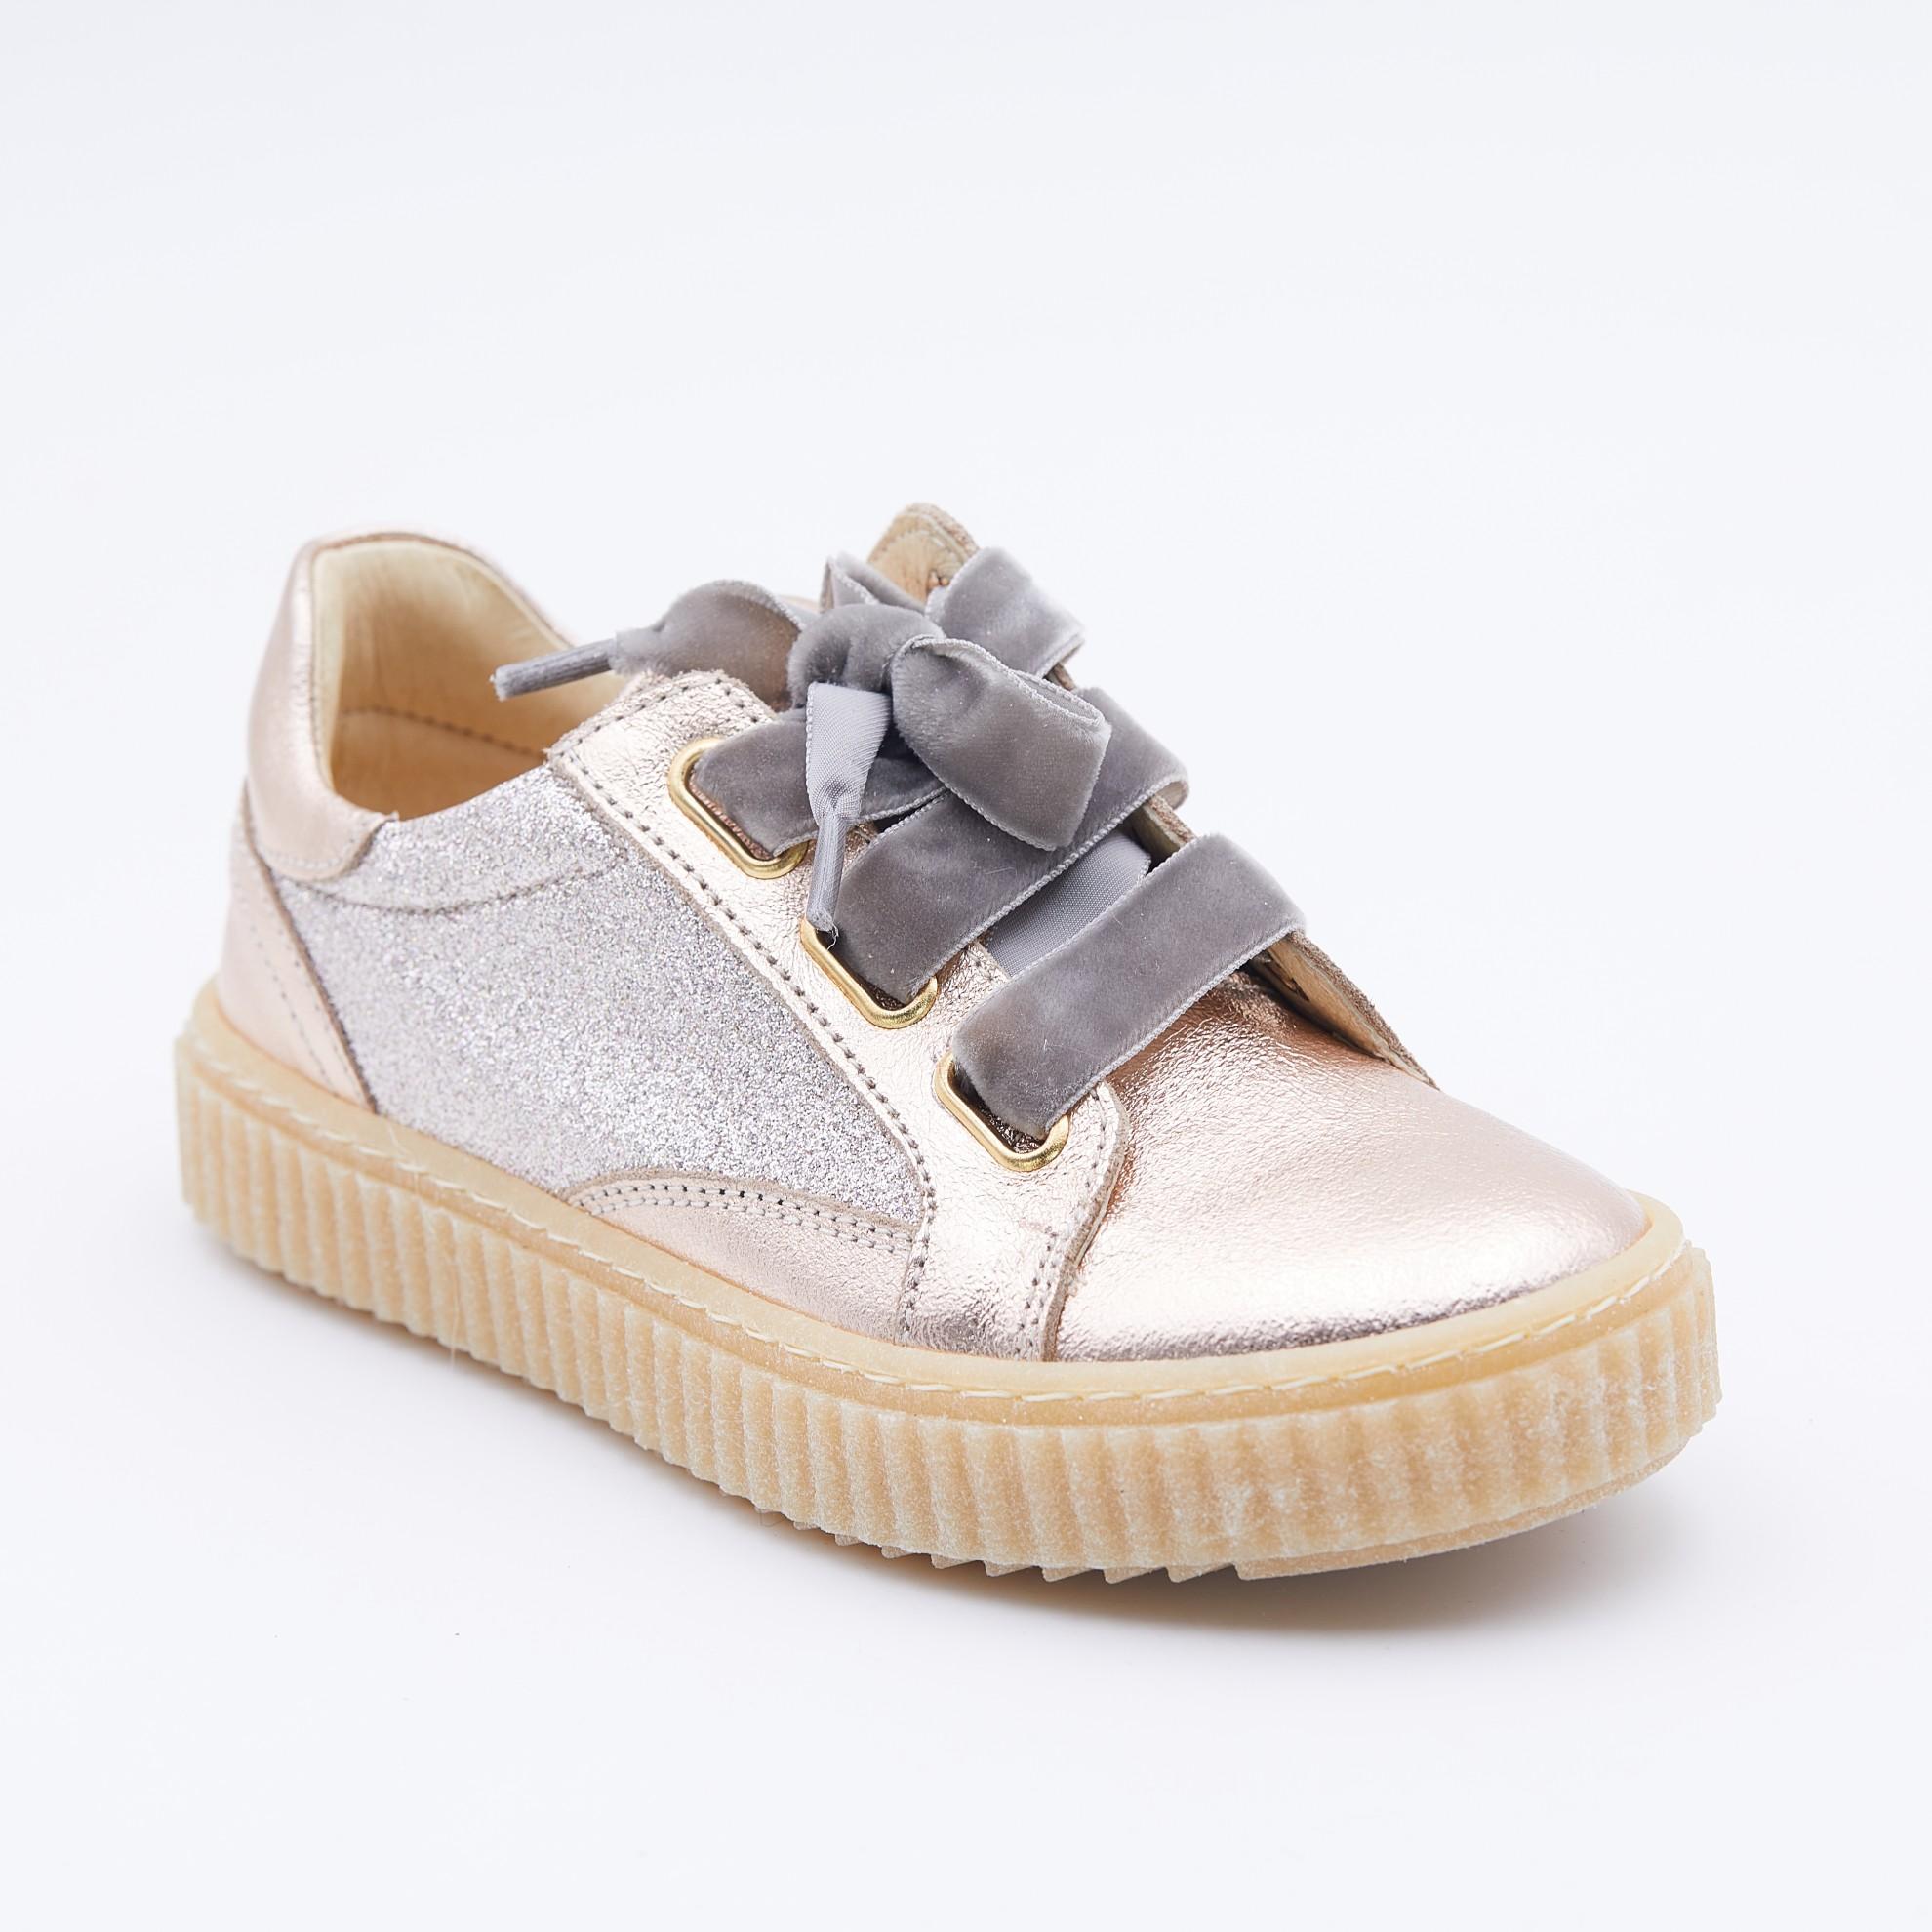 Pantofi bronz/aurii siret catifea